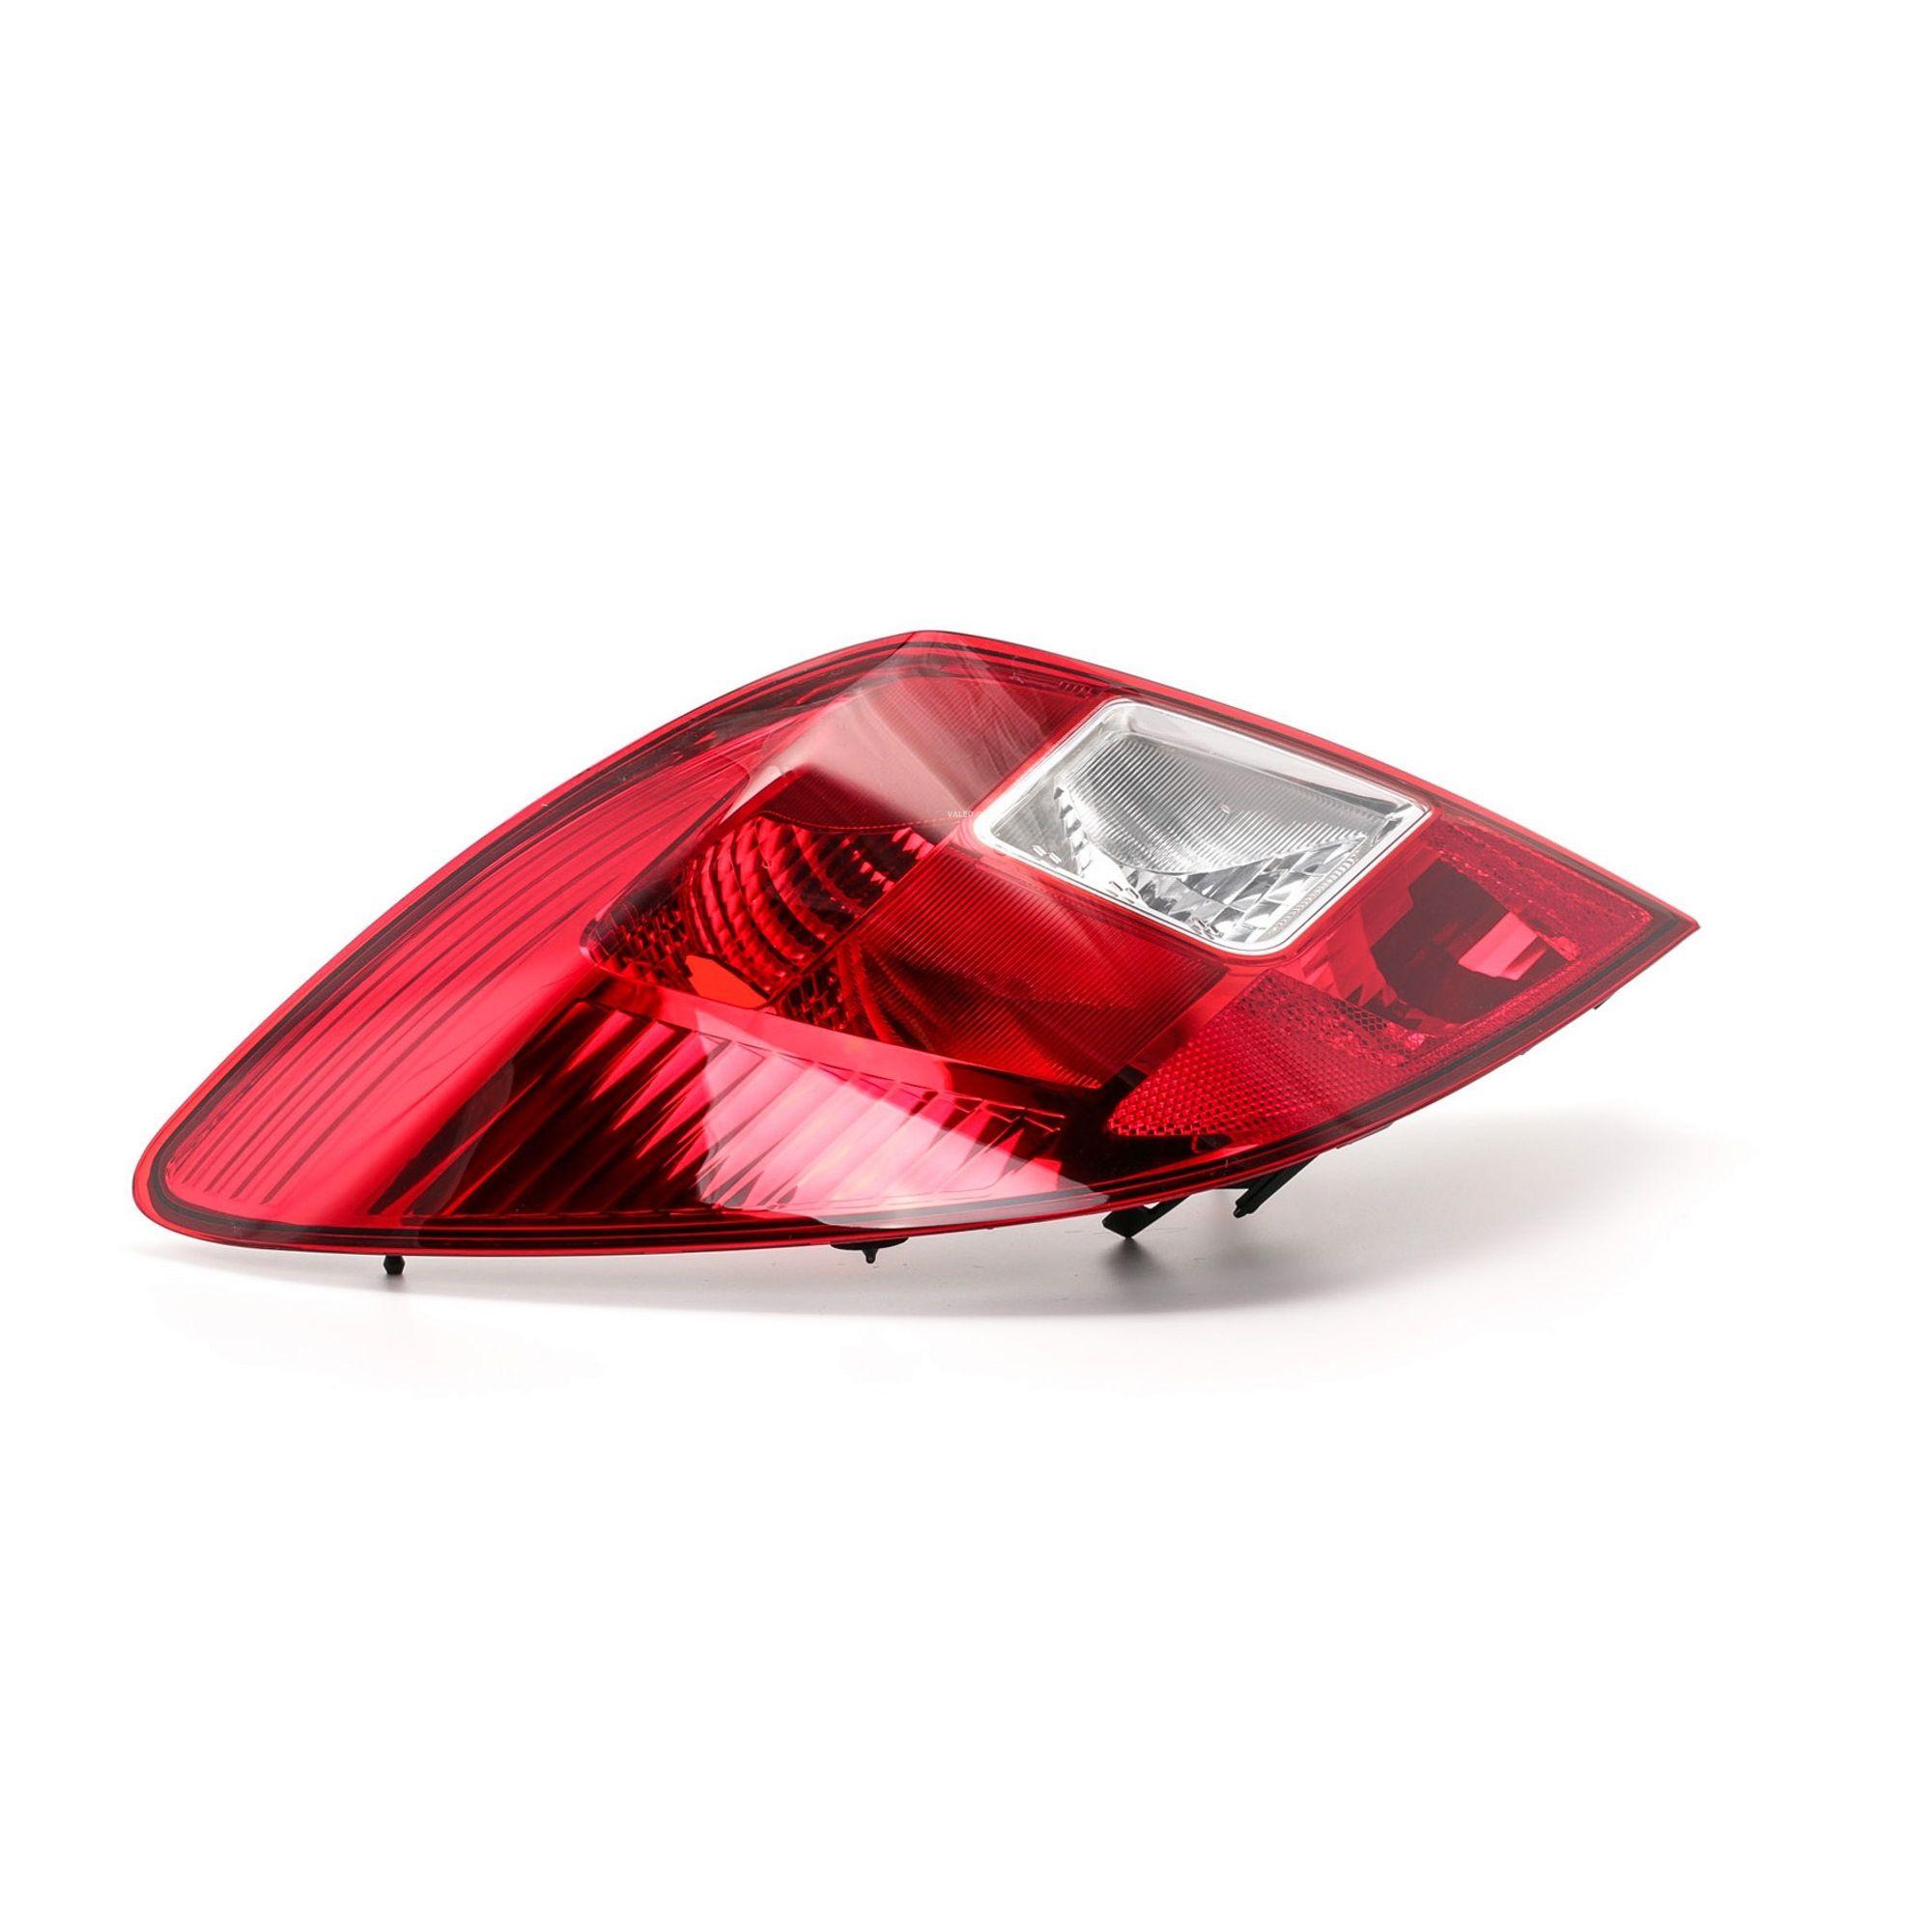 VALEO: Original Rückleuchten 043391 (Links-/Rechtslenker: für Links-/Rechtslenker, Farbe: rot)